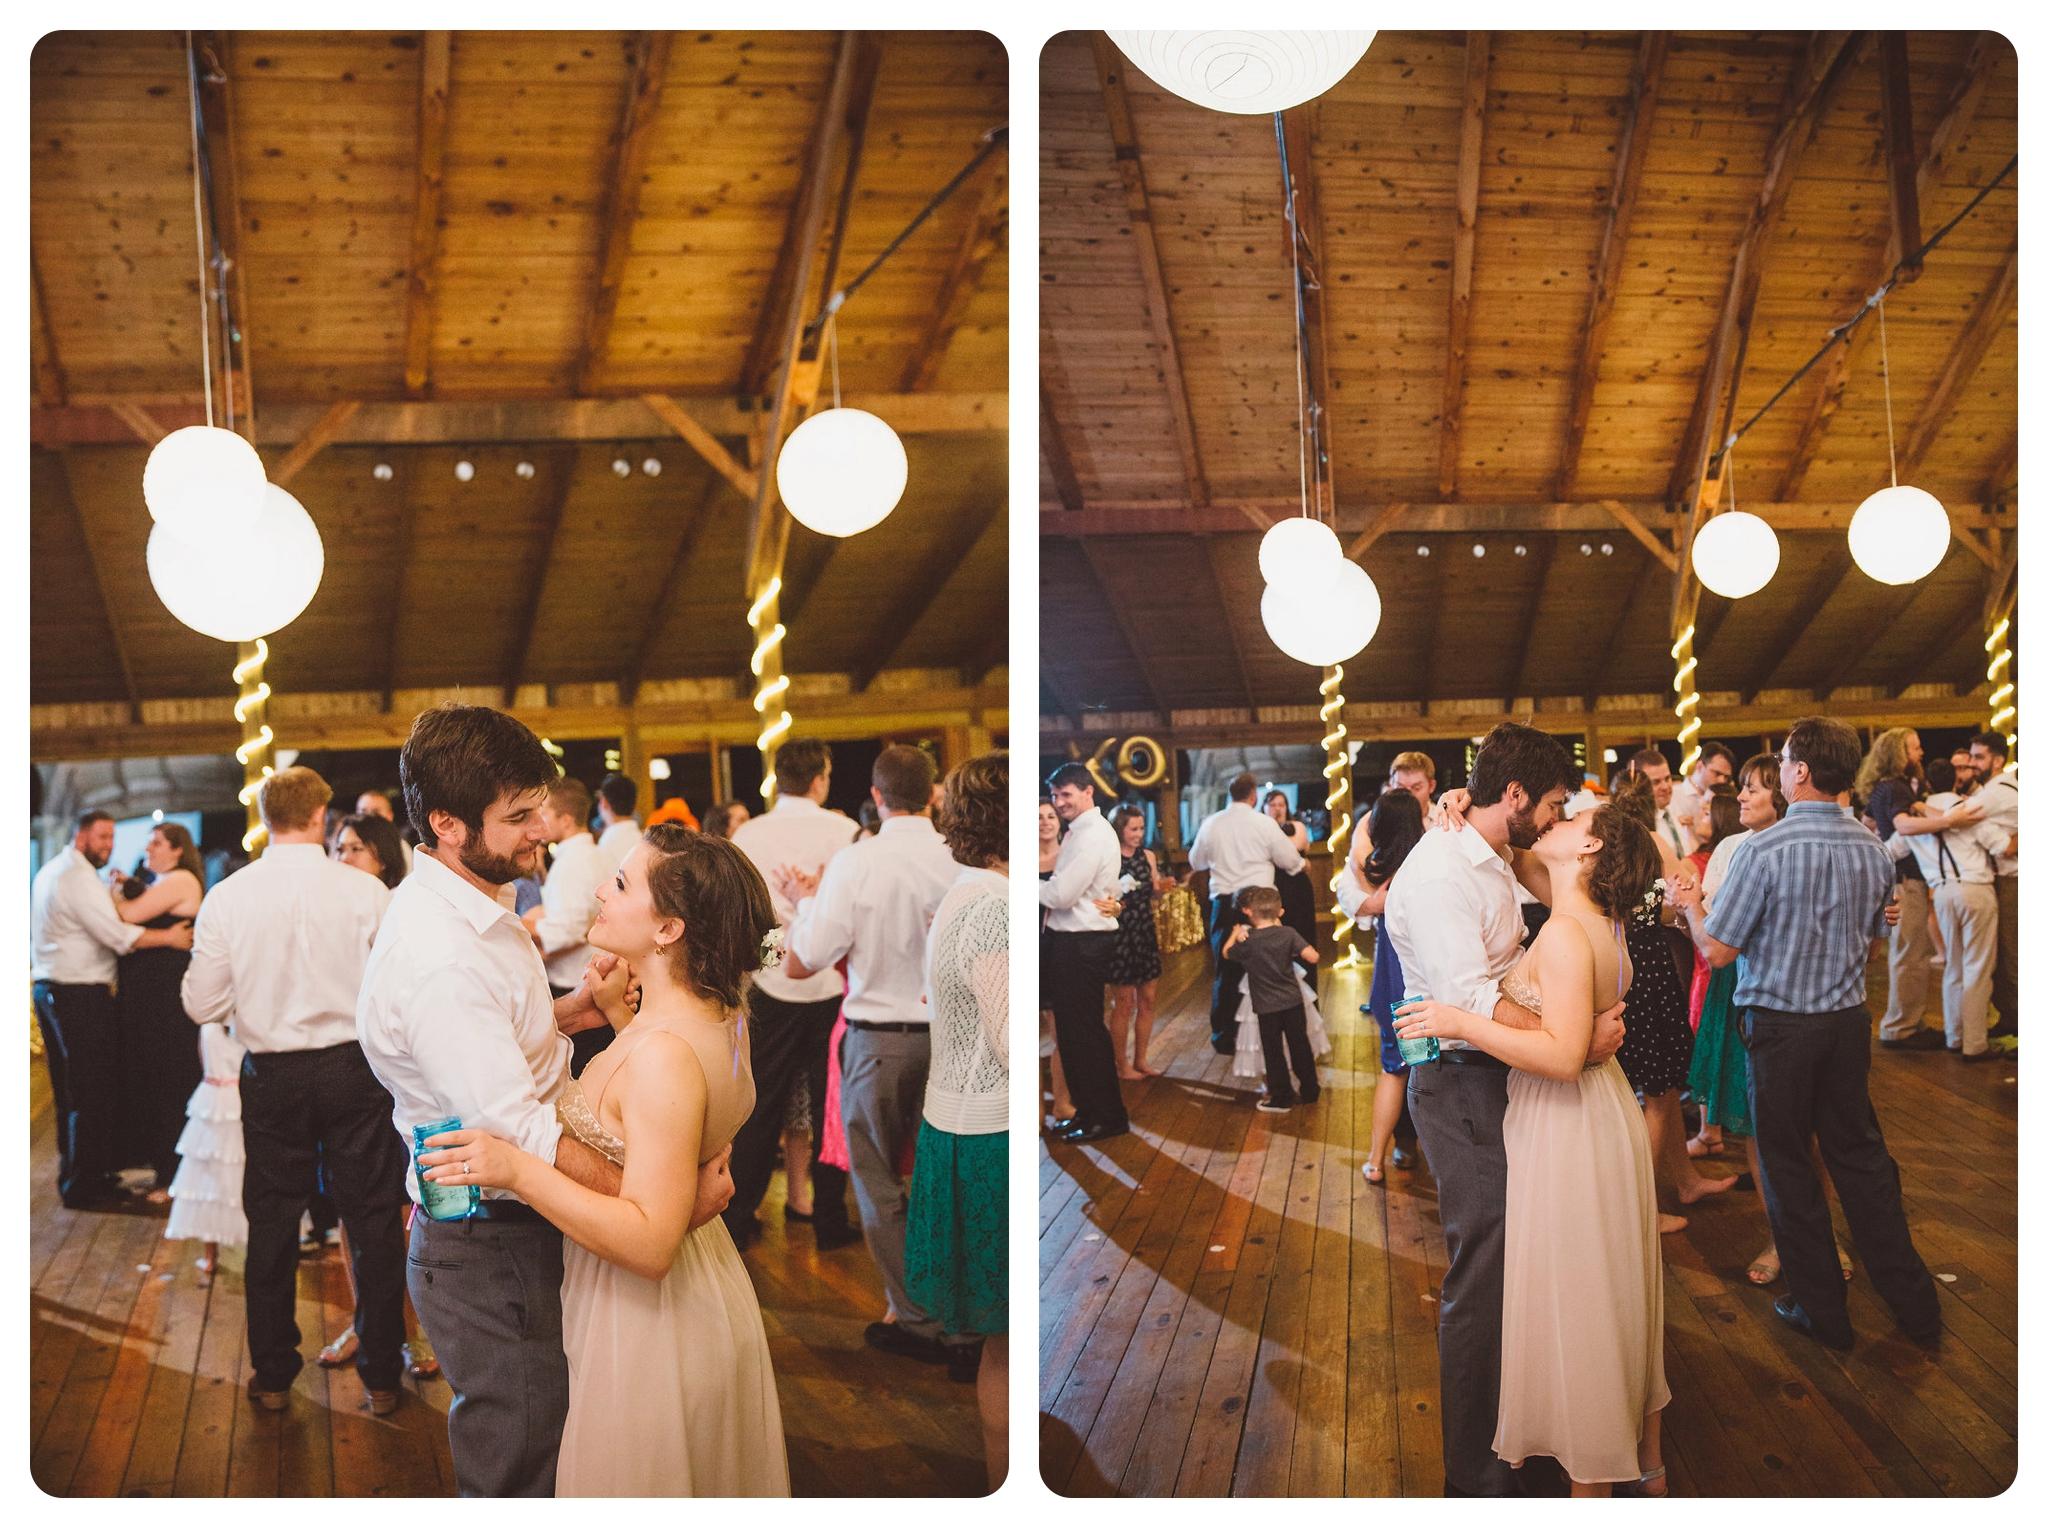 Braeloch-Weddings-Wedding-Photographer-Pat-Cori-Photography-049.jpg